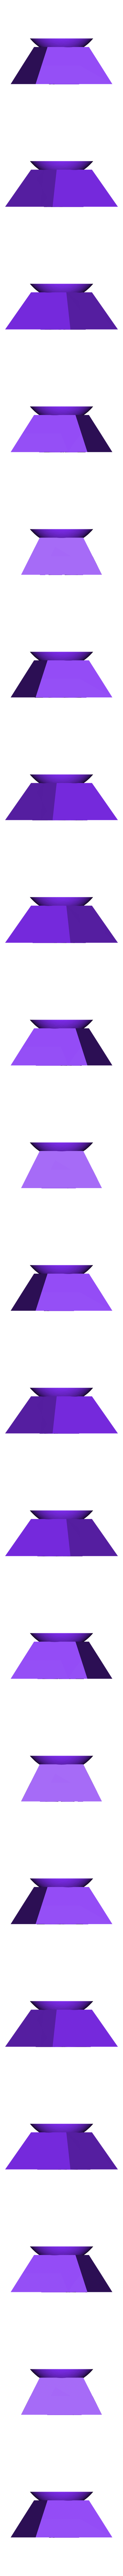 "tirelire oeuf batman socle .stl Download free STL file ""Batman egg"" piggy bank • 3D printing model, psl"